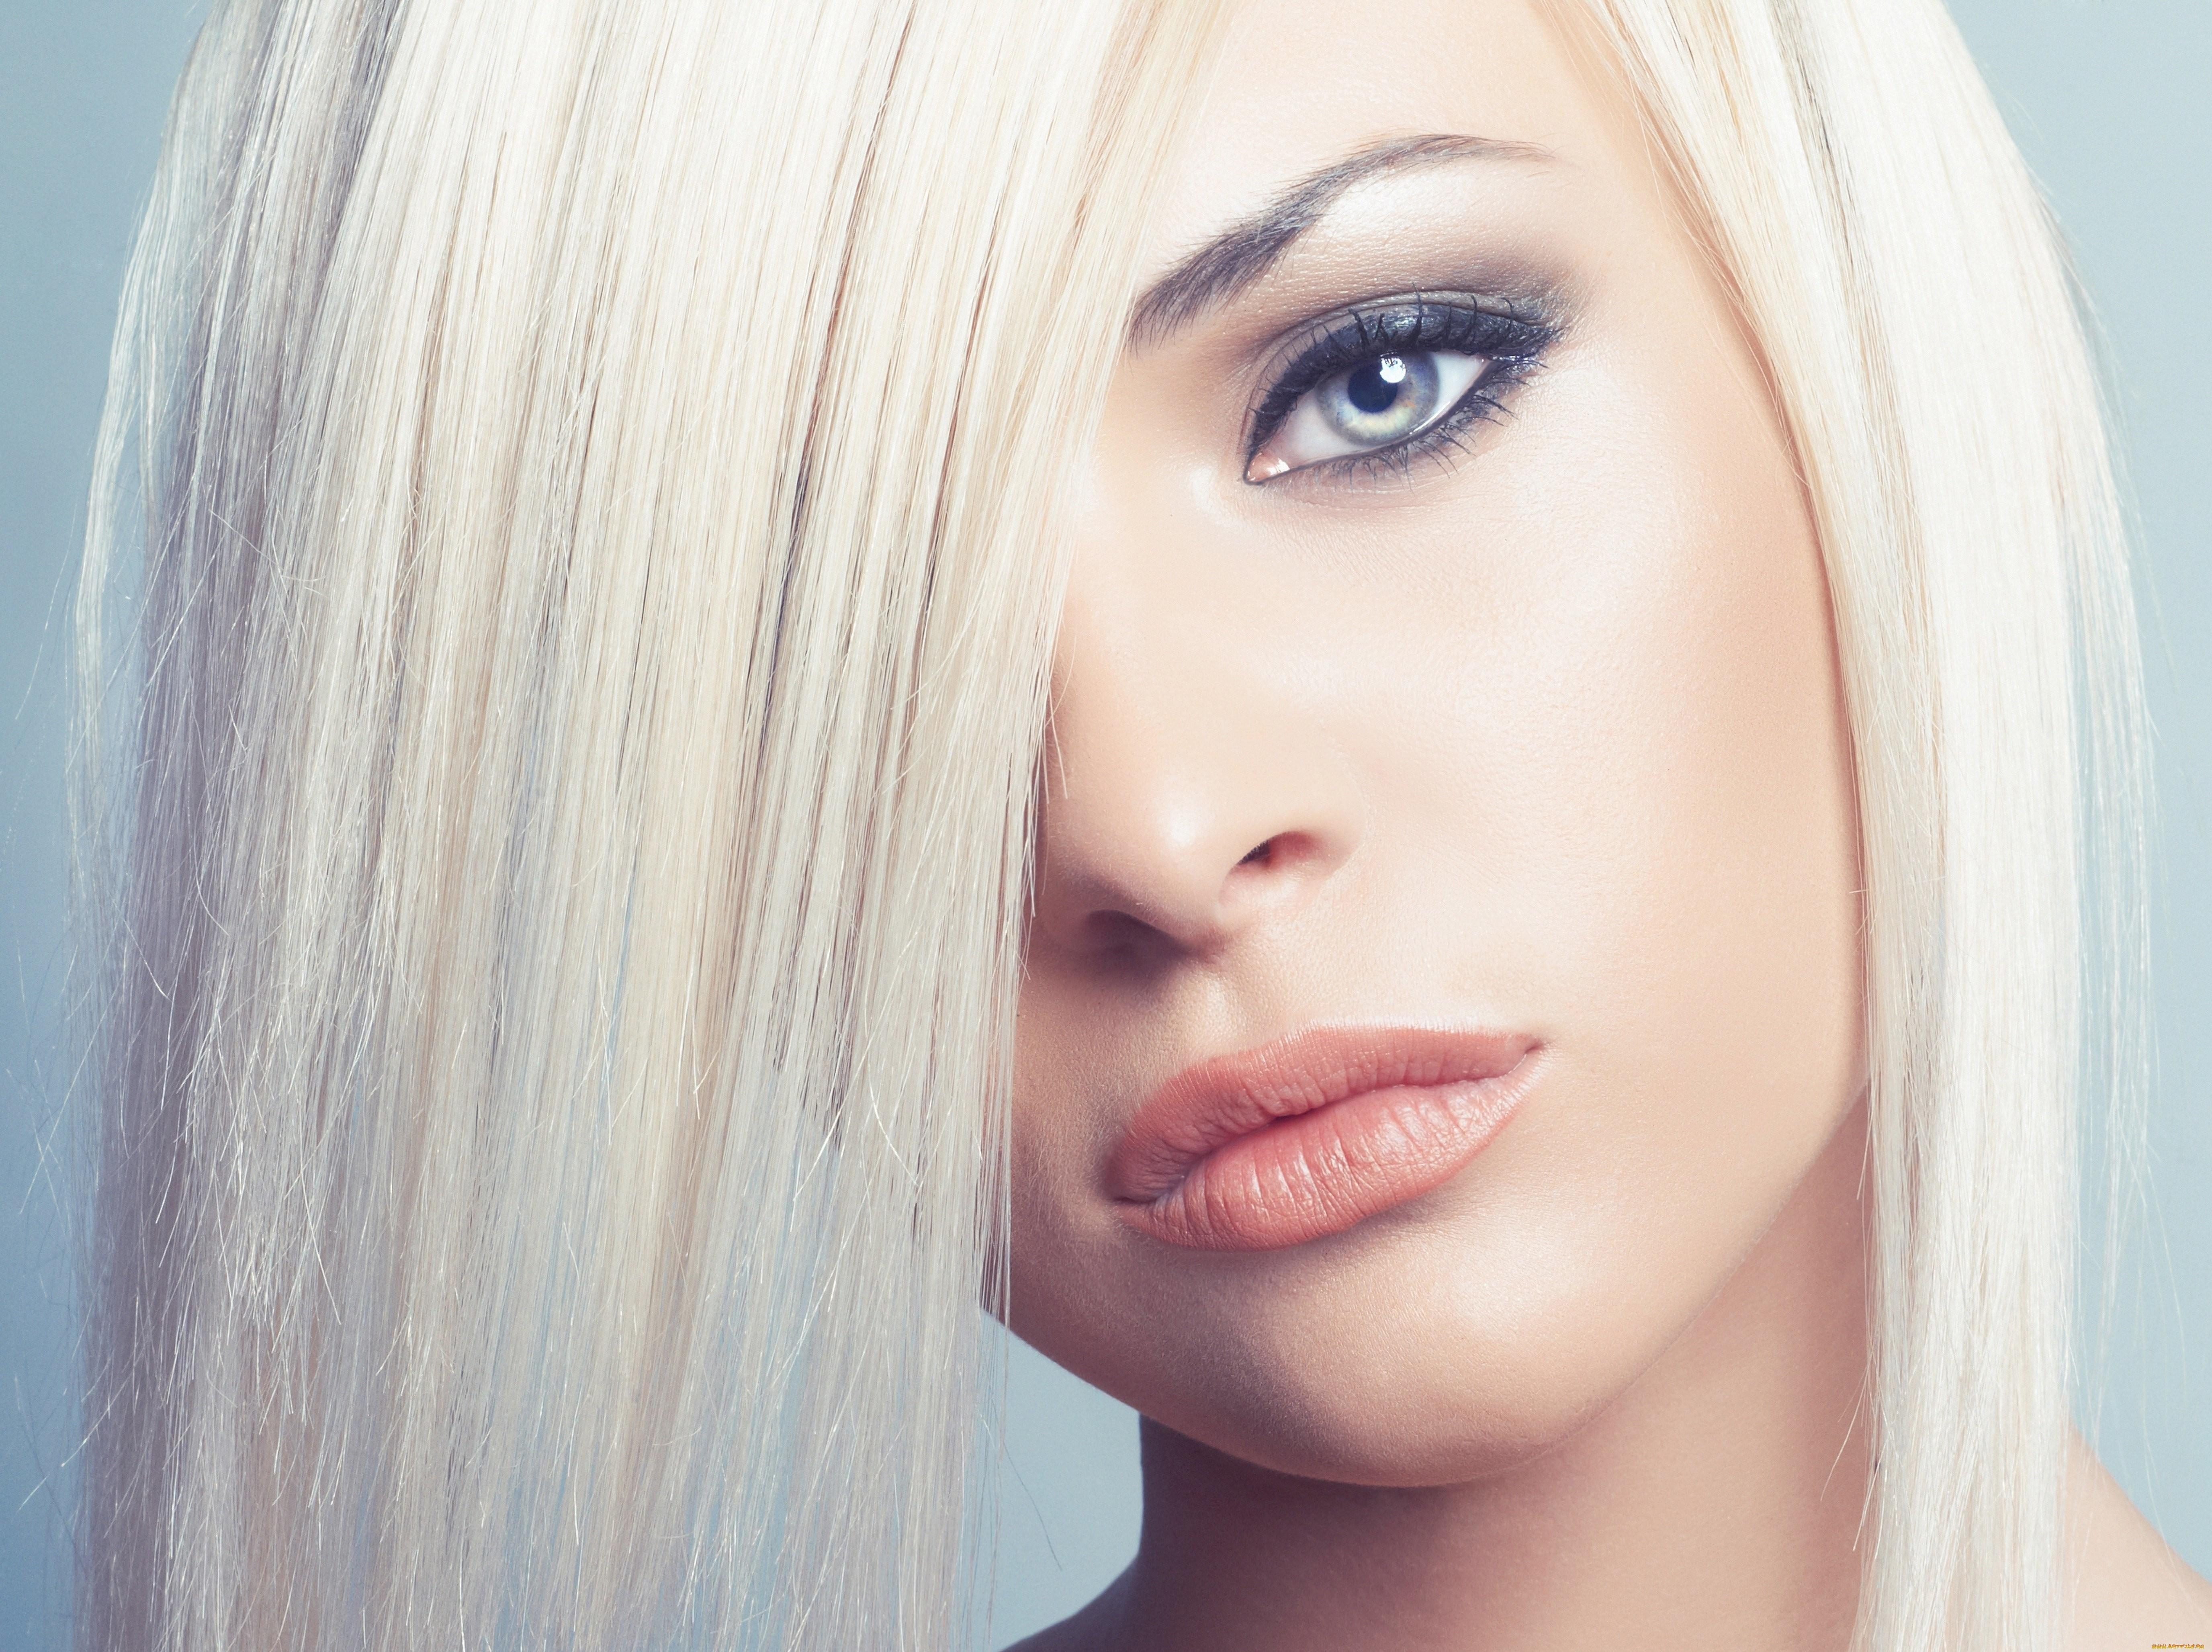 Wallpaper Face Women Model Blonde Long Hair Blue: Wallpaper : Face, Women, Model, Portrait, Eyes, Long Hair